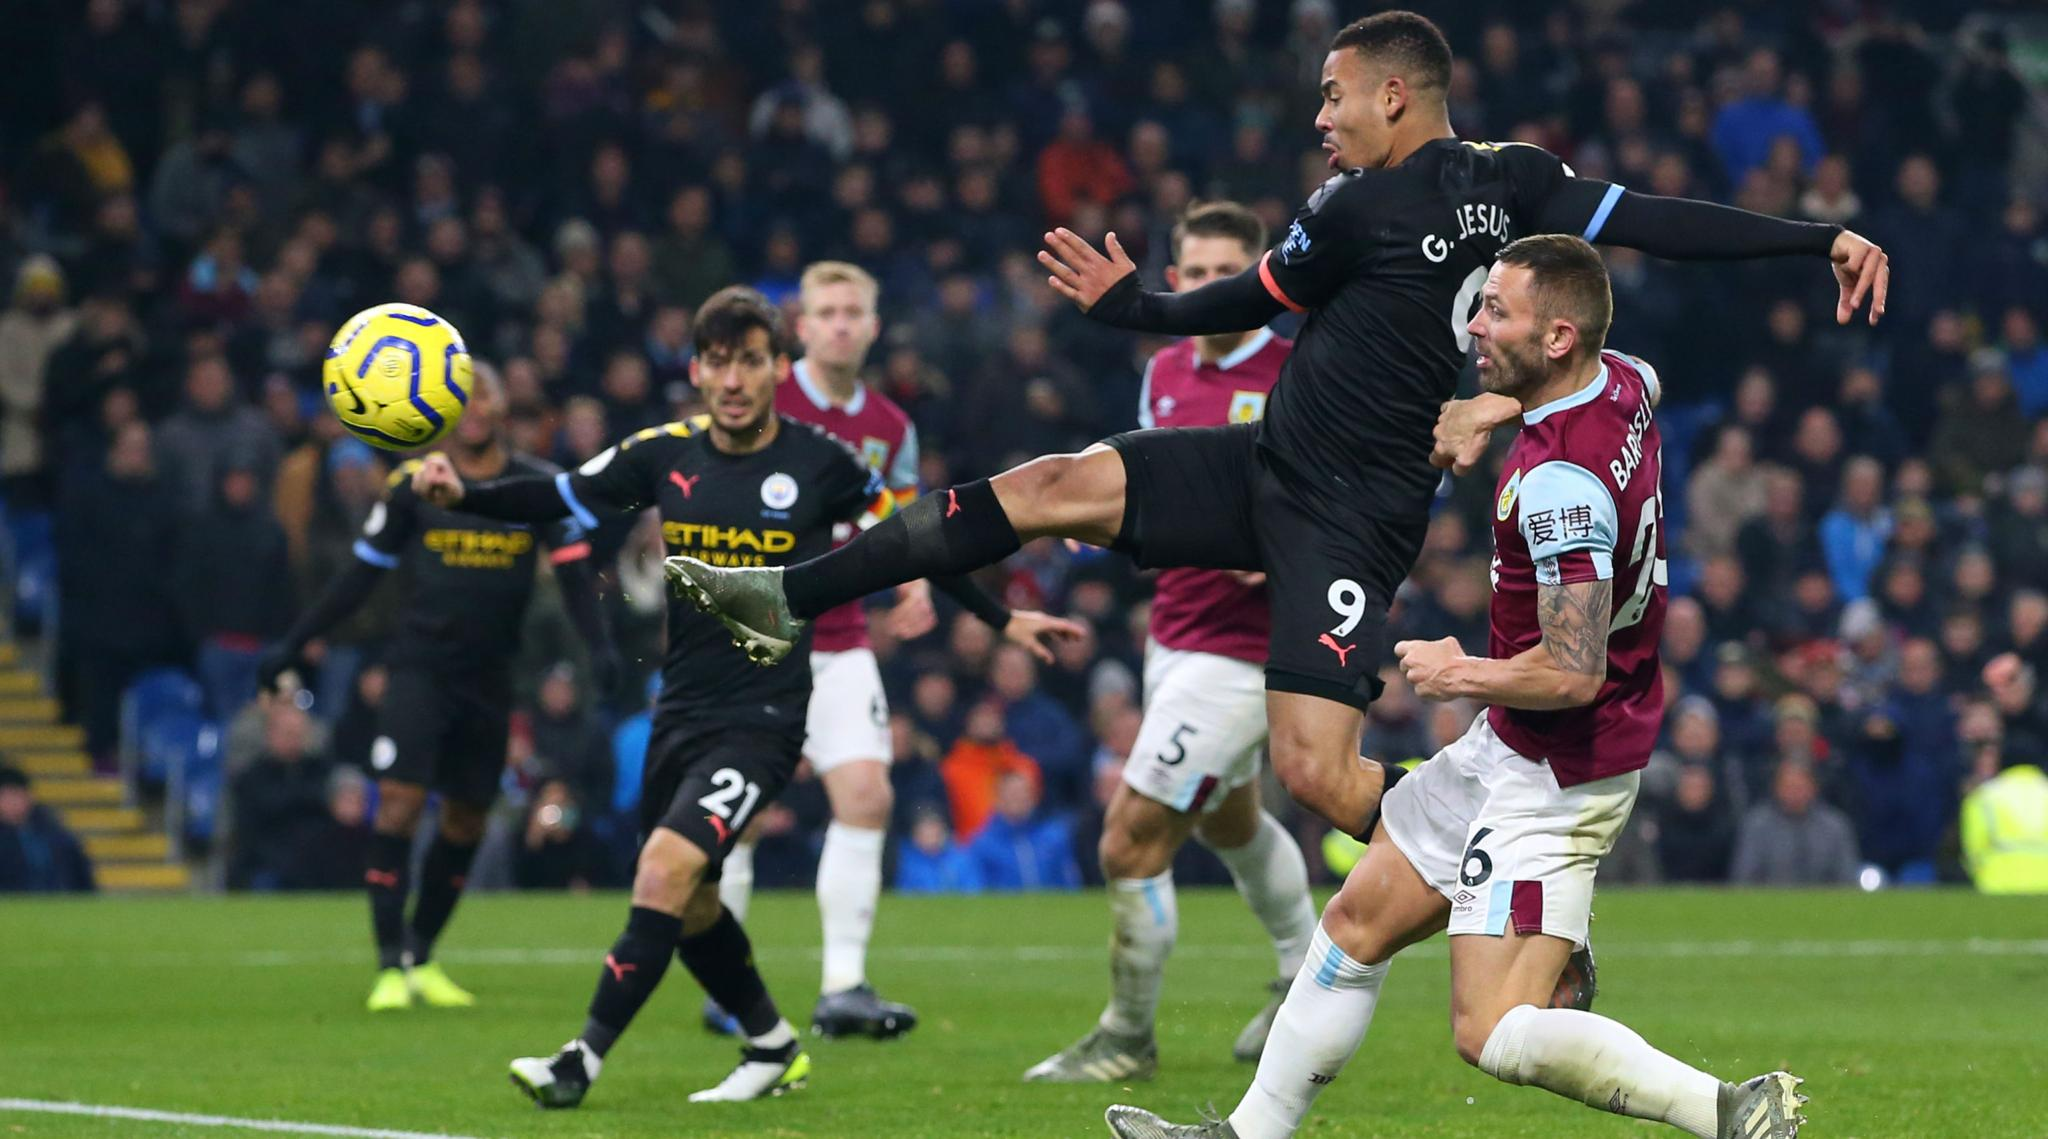 Burnley 1-4 Manchester City, Premier League 2019-20 Result: Gabriel Jesus Finds Goal Touch as Man City Bounce Back to Thrash the Clarets